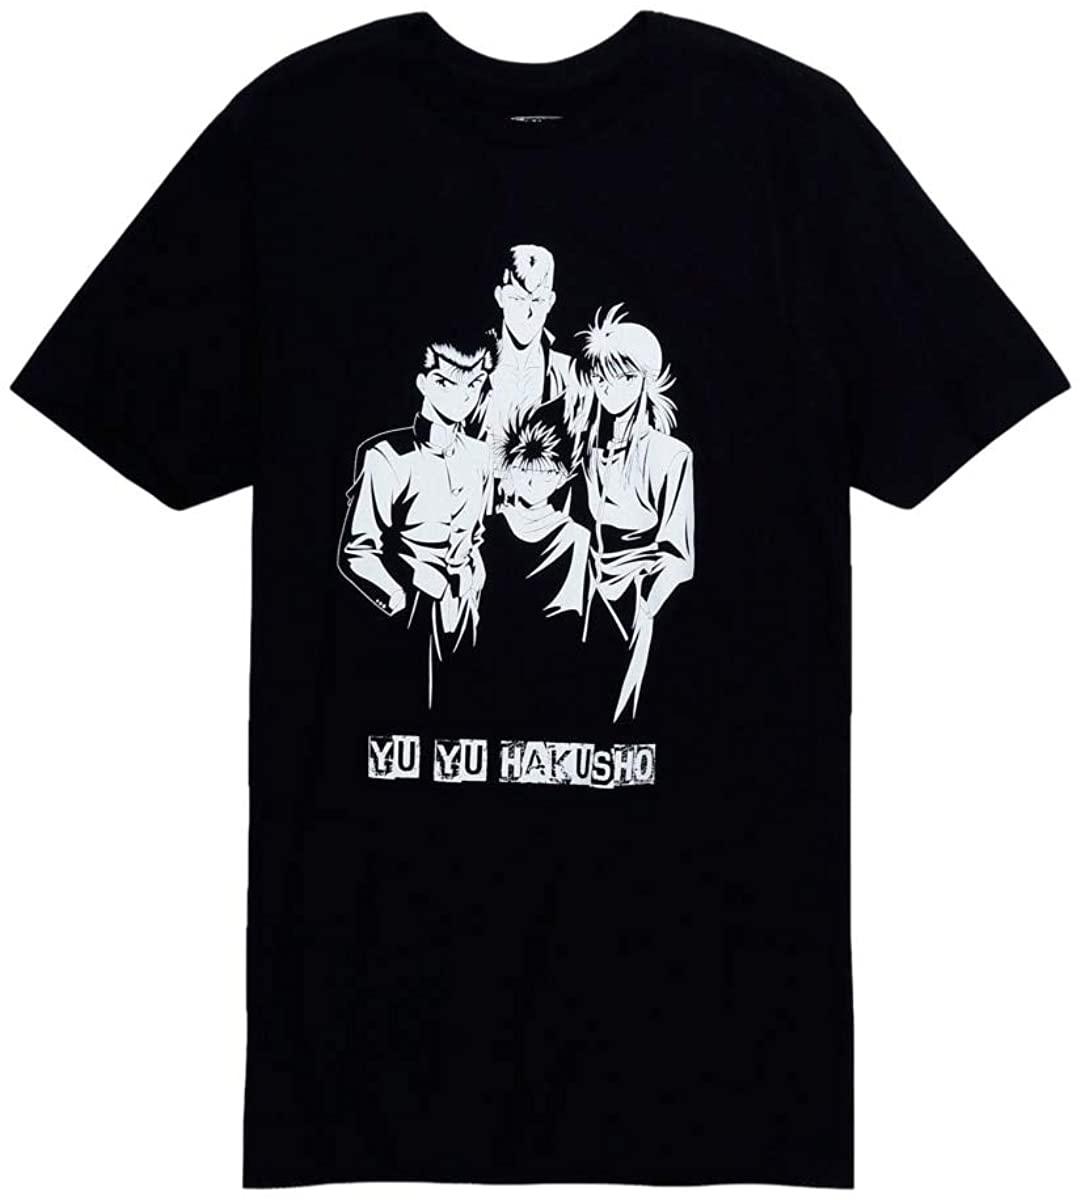 Hot Topic Yu Yu Hakusho Black & White Group T-Shirt